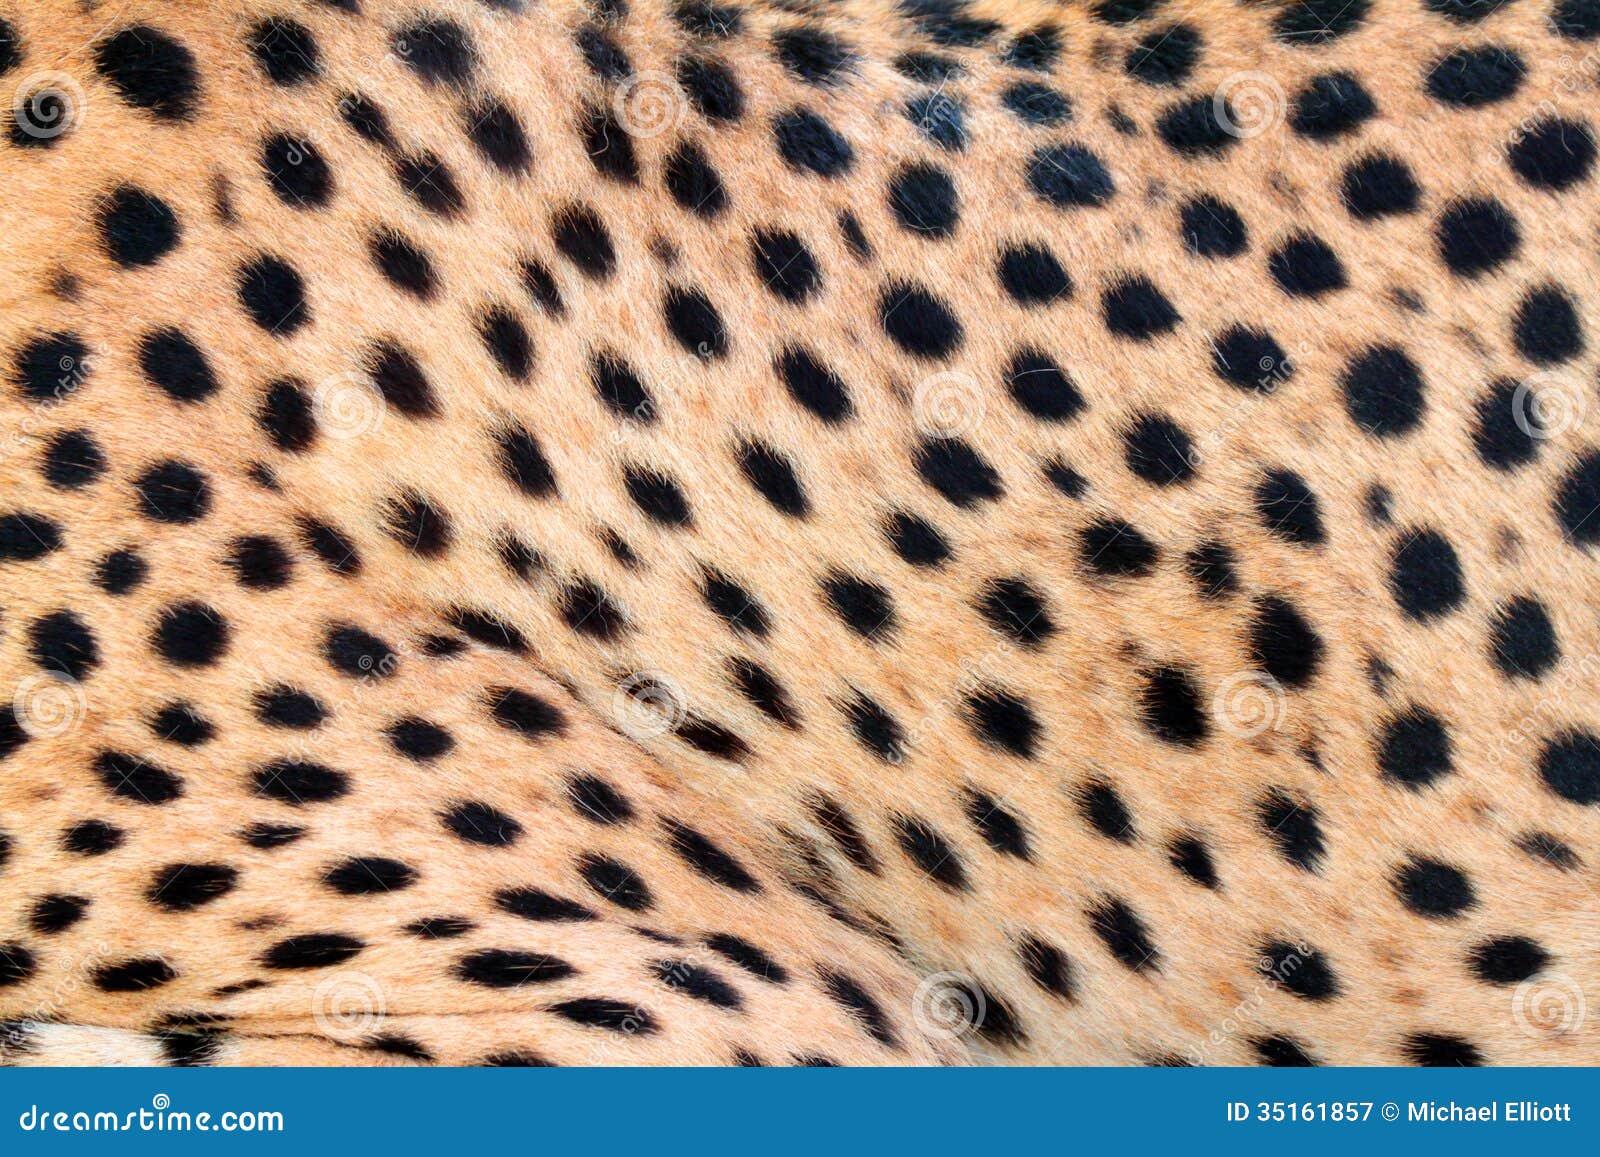 Cheetah Fur Close Up Cheetah fur